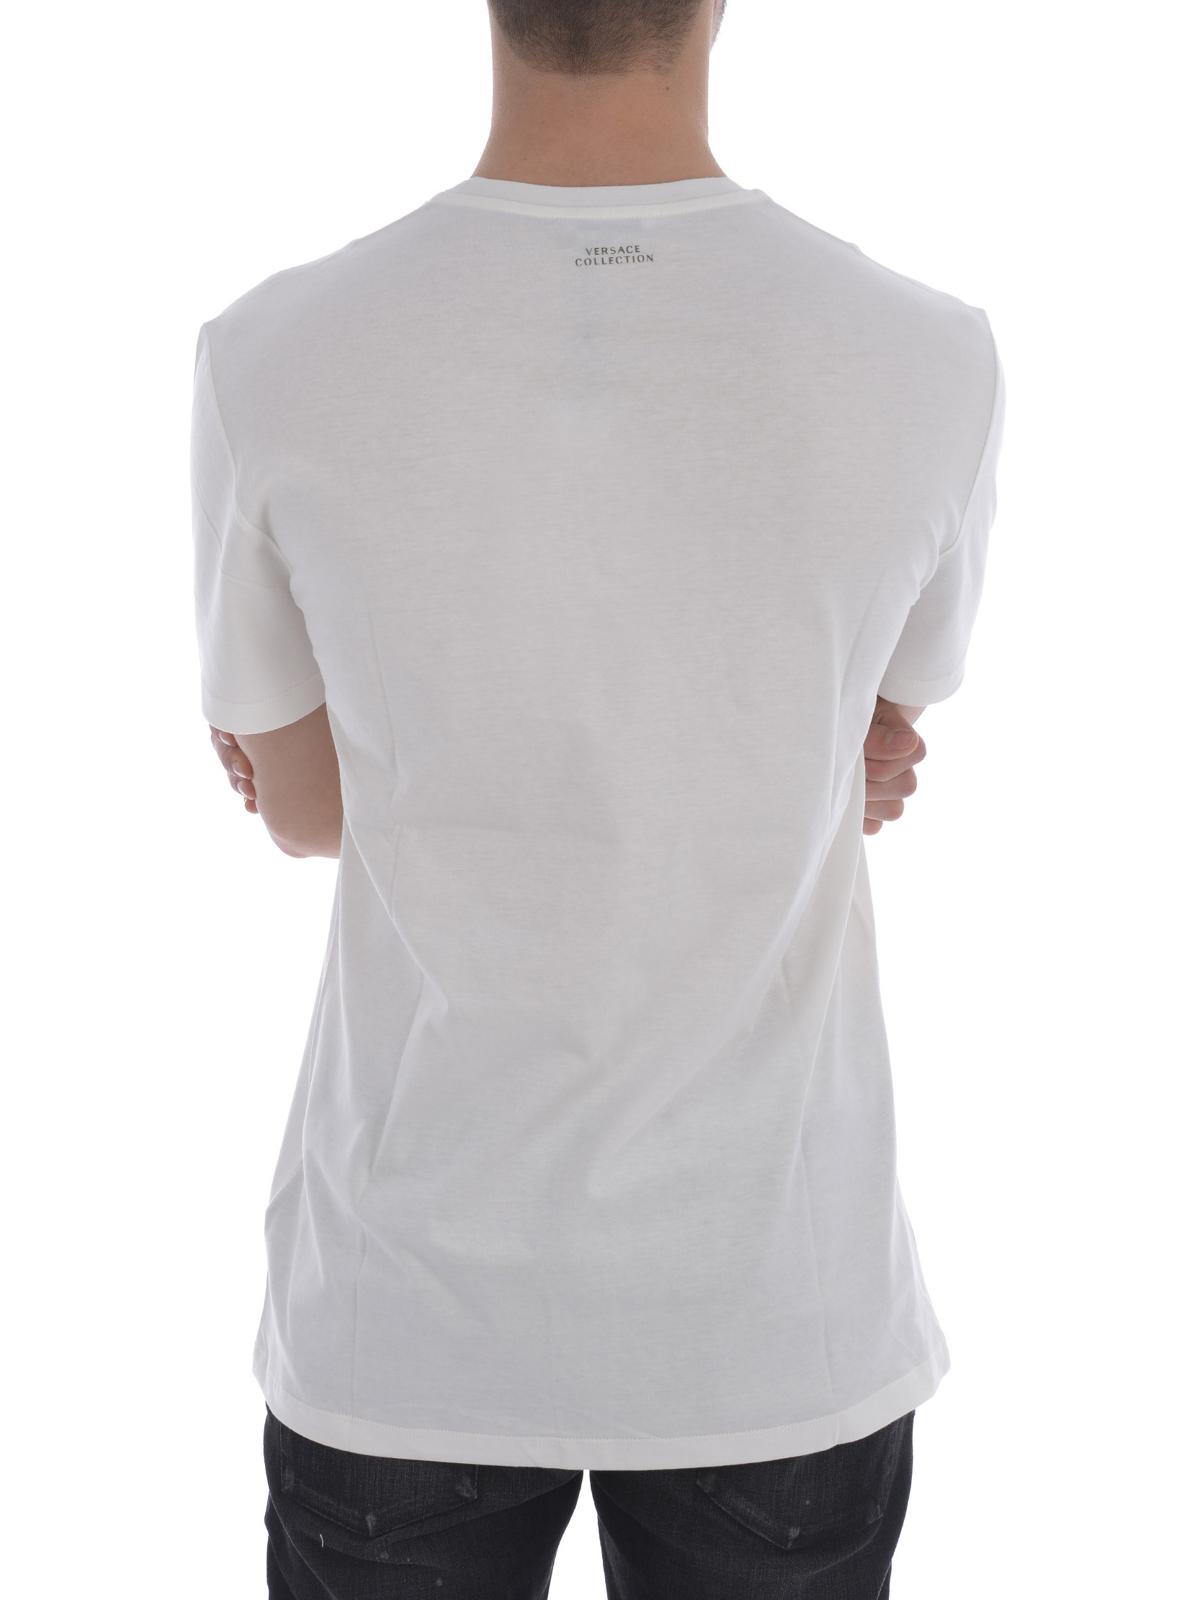 33413882a243 iKRIX VERSACE COLLECTION  Chemises - Chemise Blanc Pour Homme